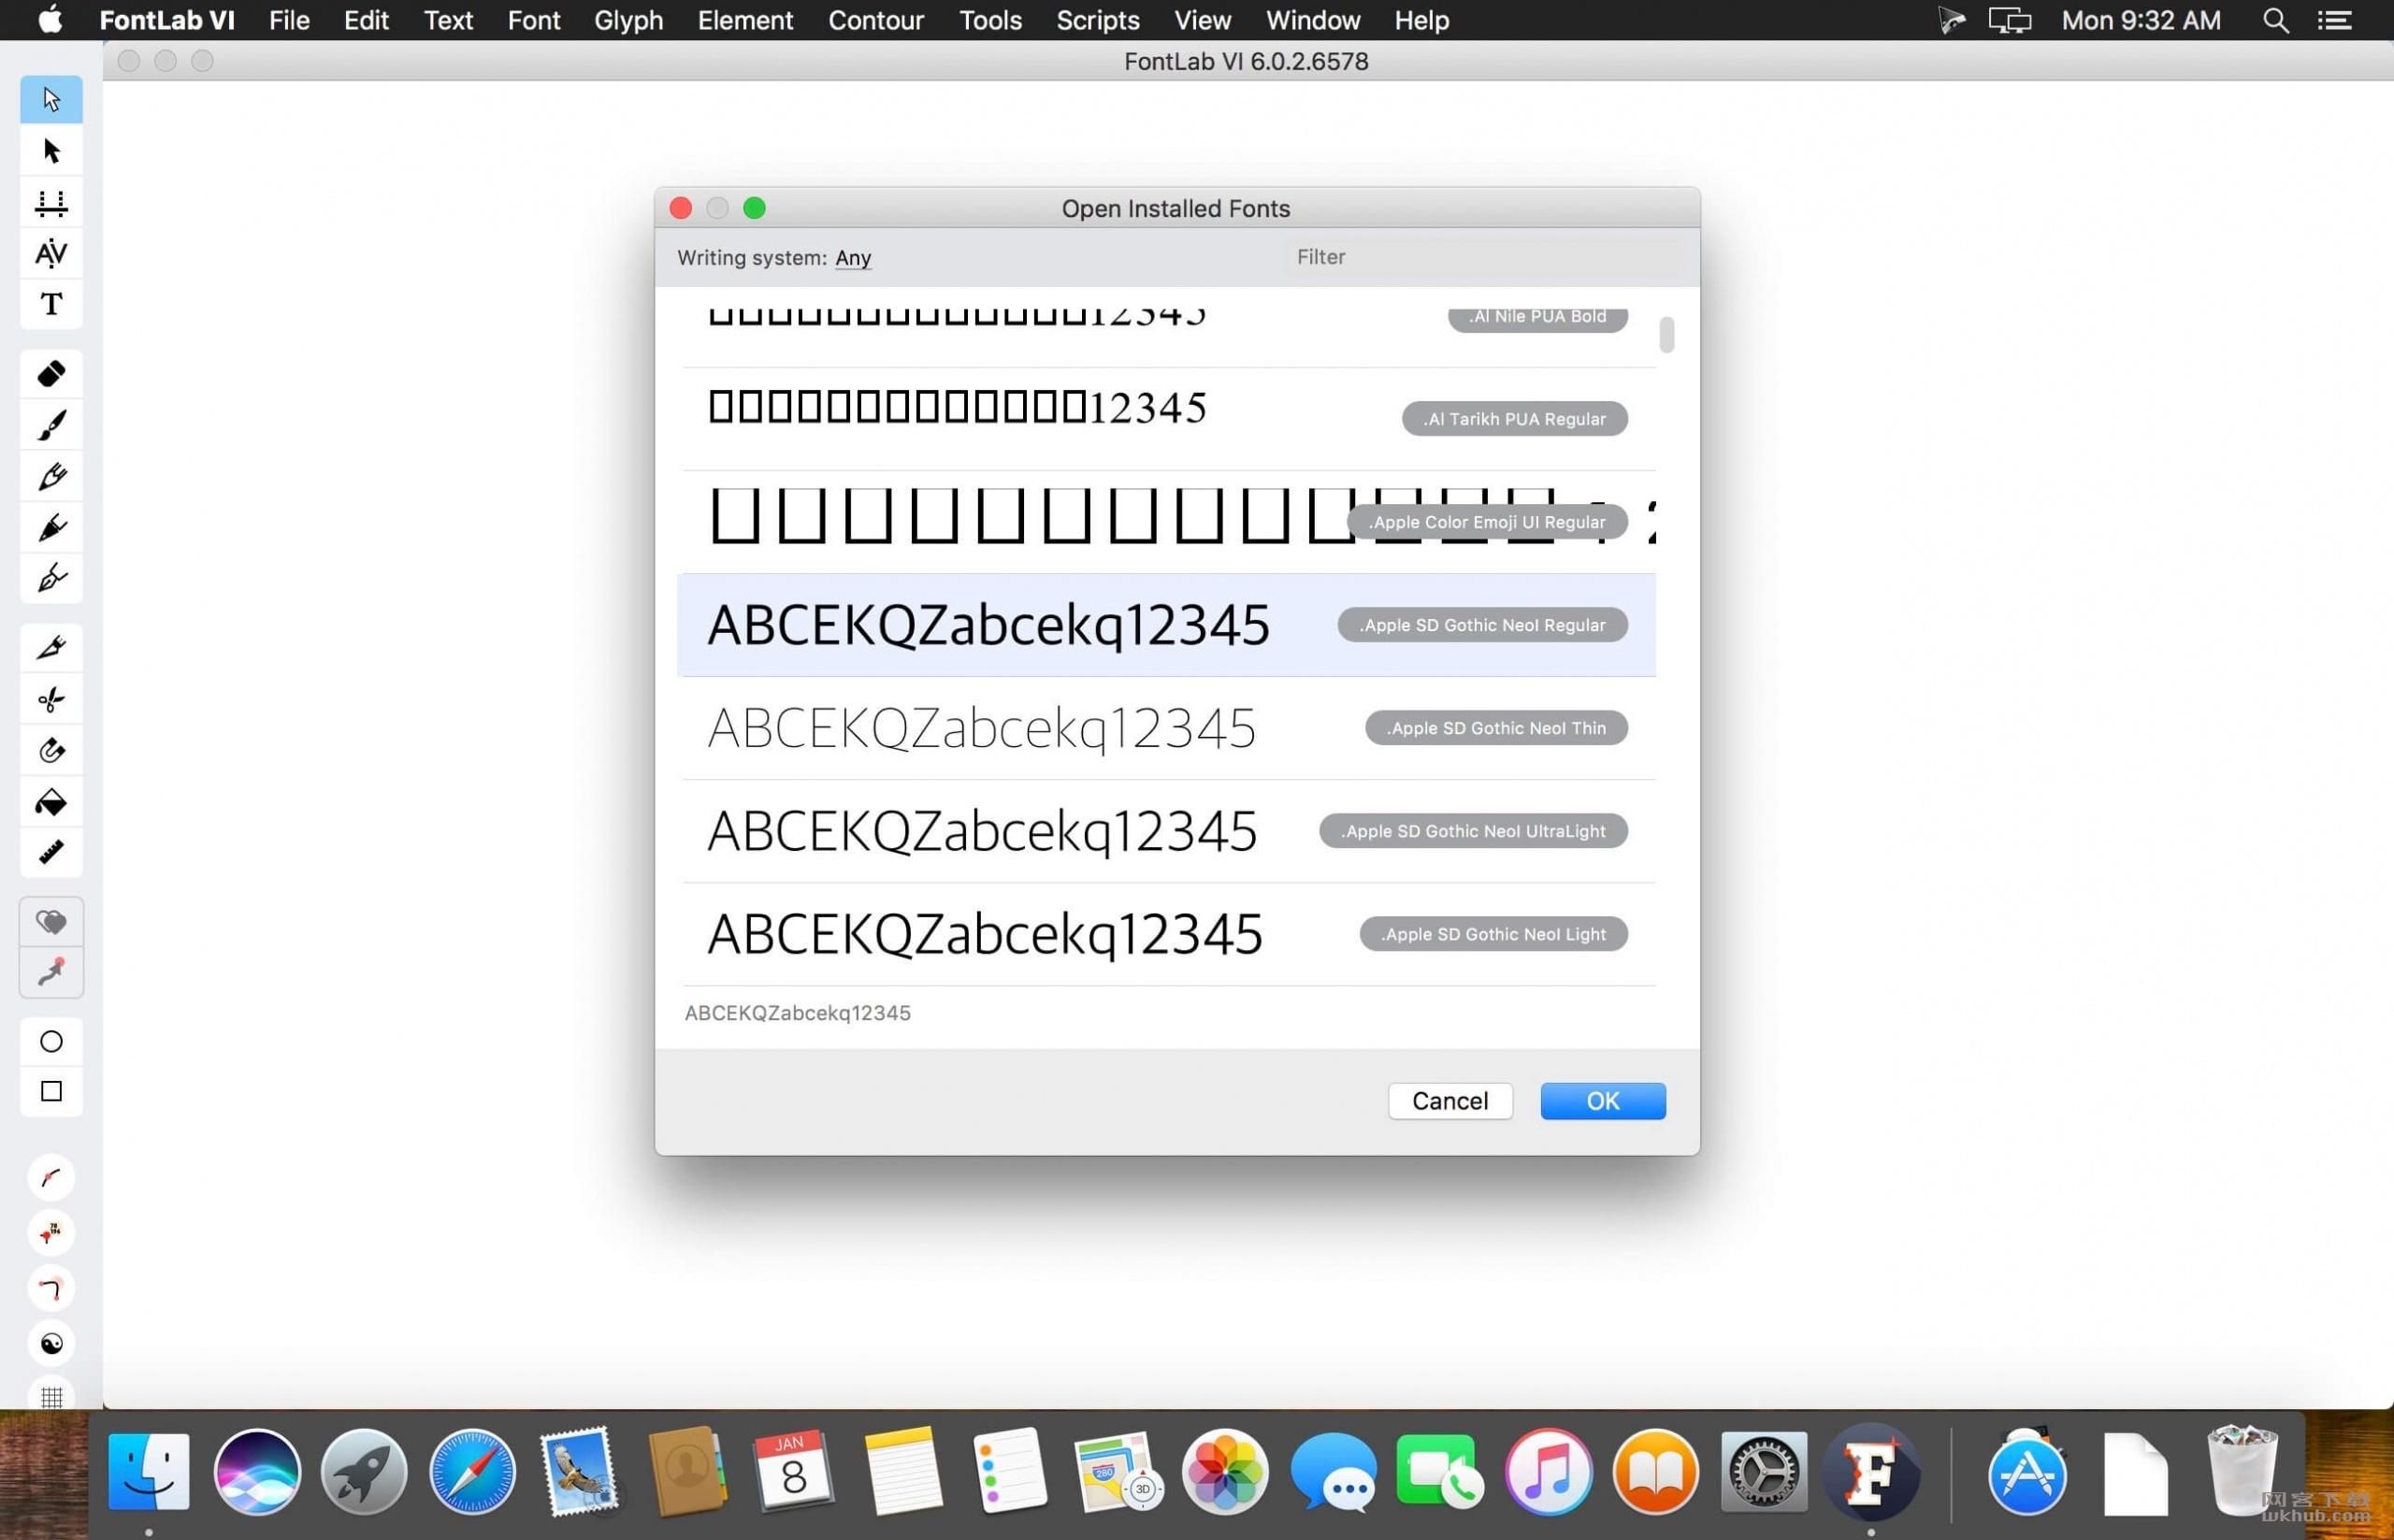 FontLab 7.1.0.7355 Beta 优秀的字体编辑工具